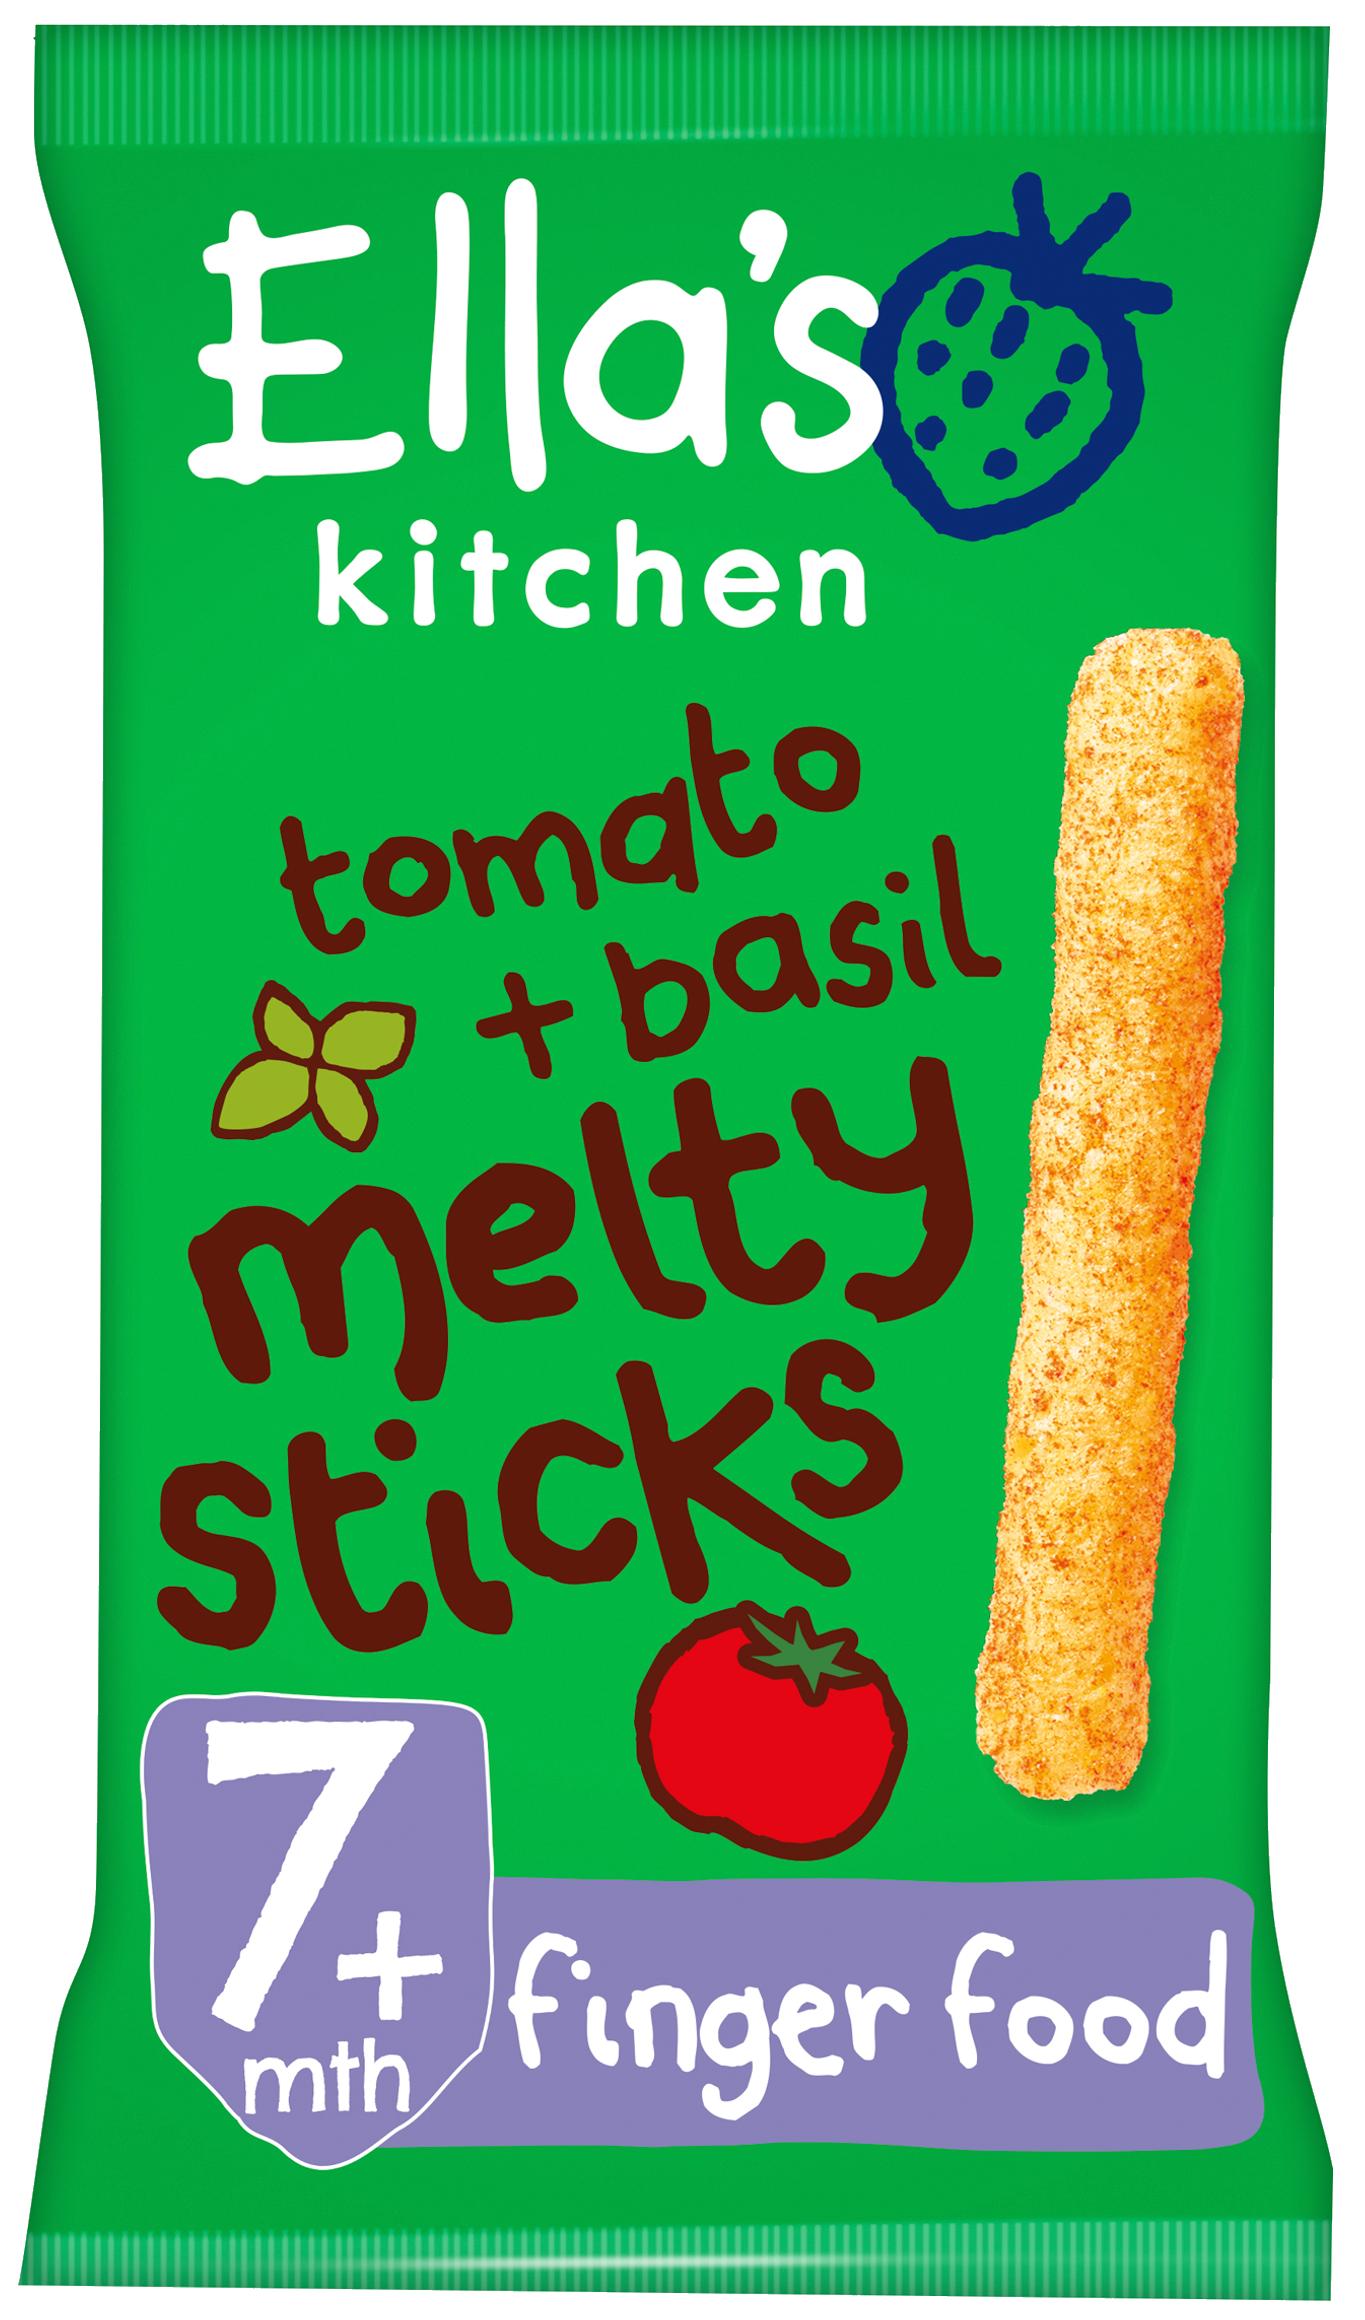 Ellas kitchen melty sticks tomato basil bag front of pack O